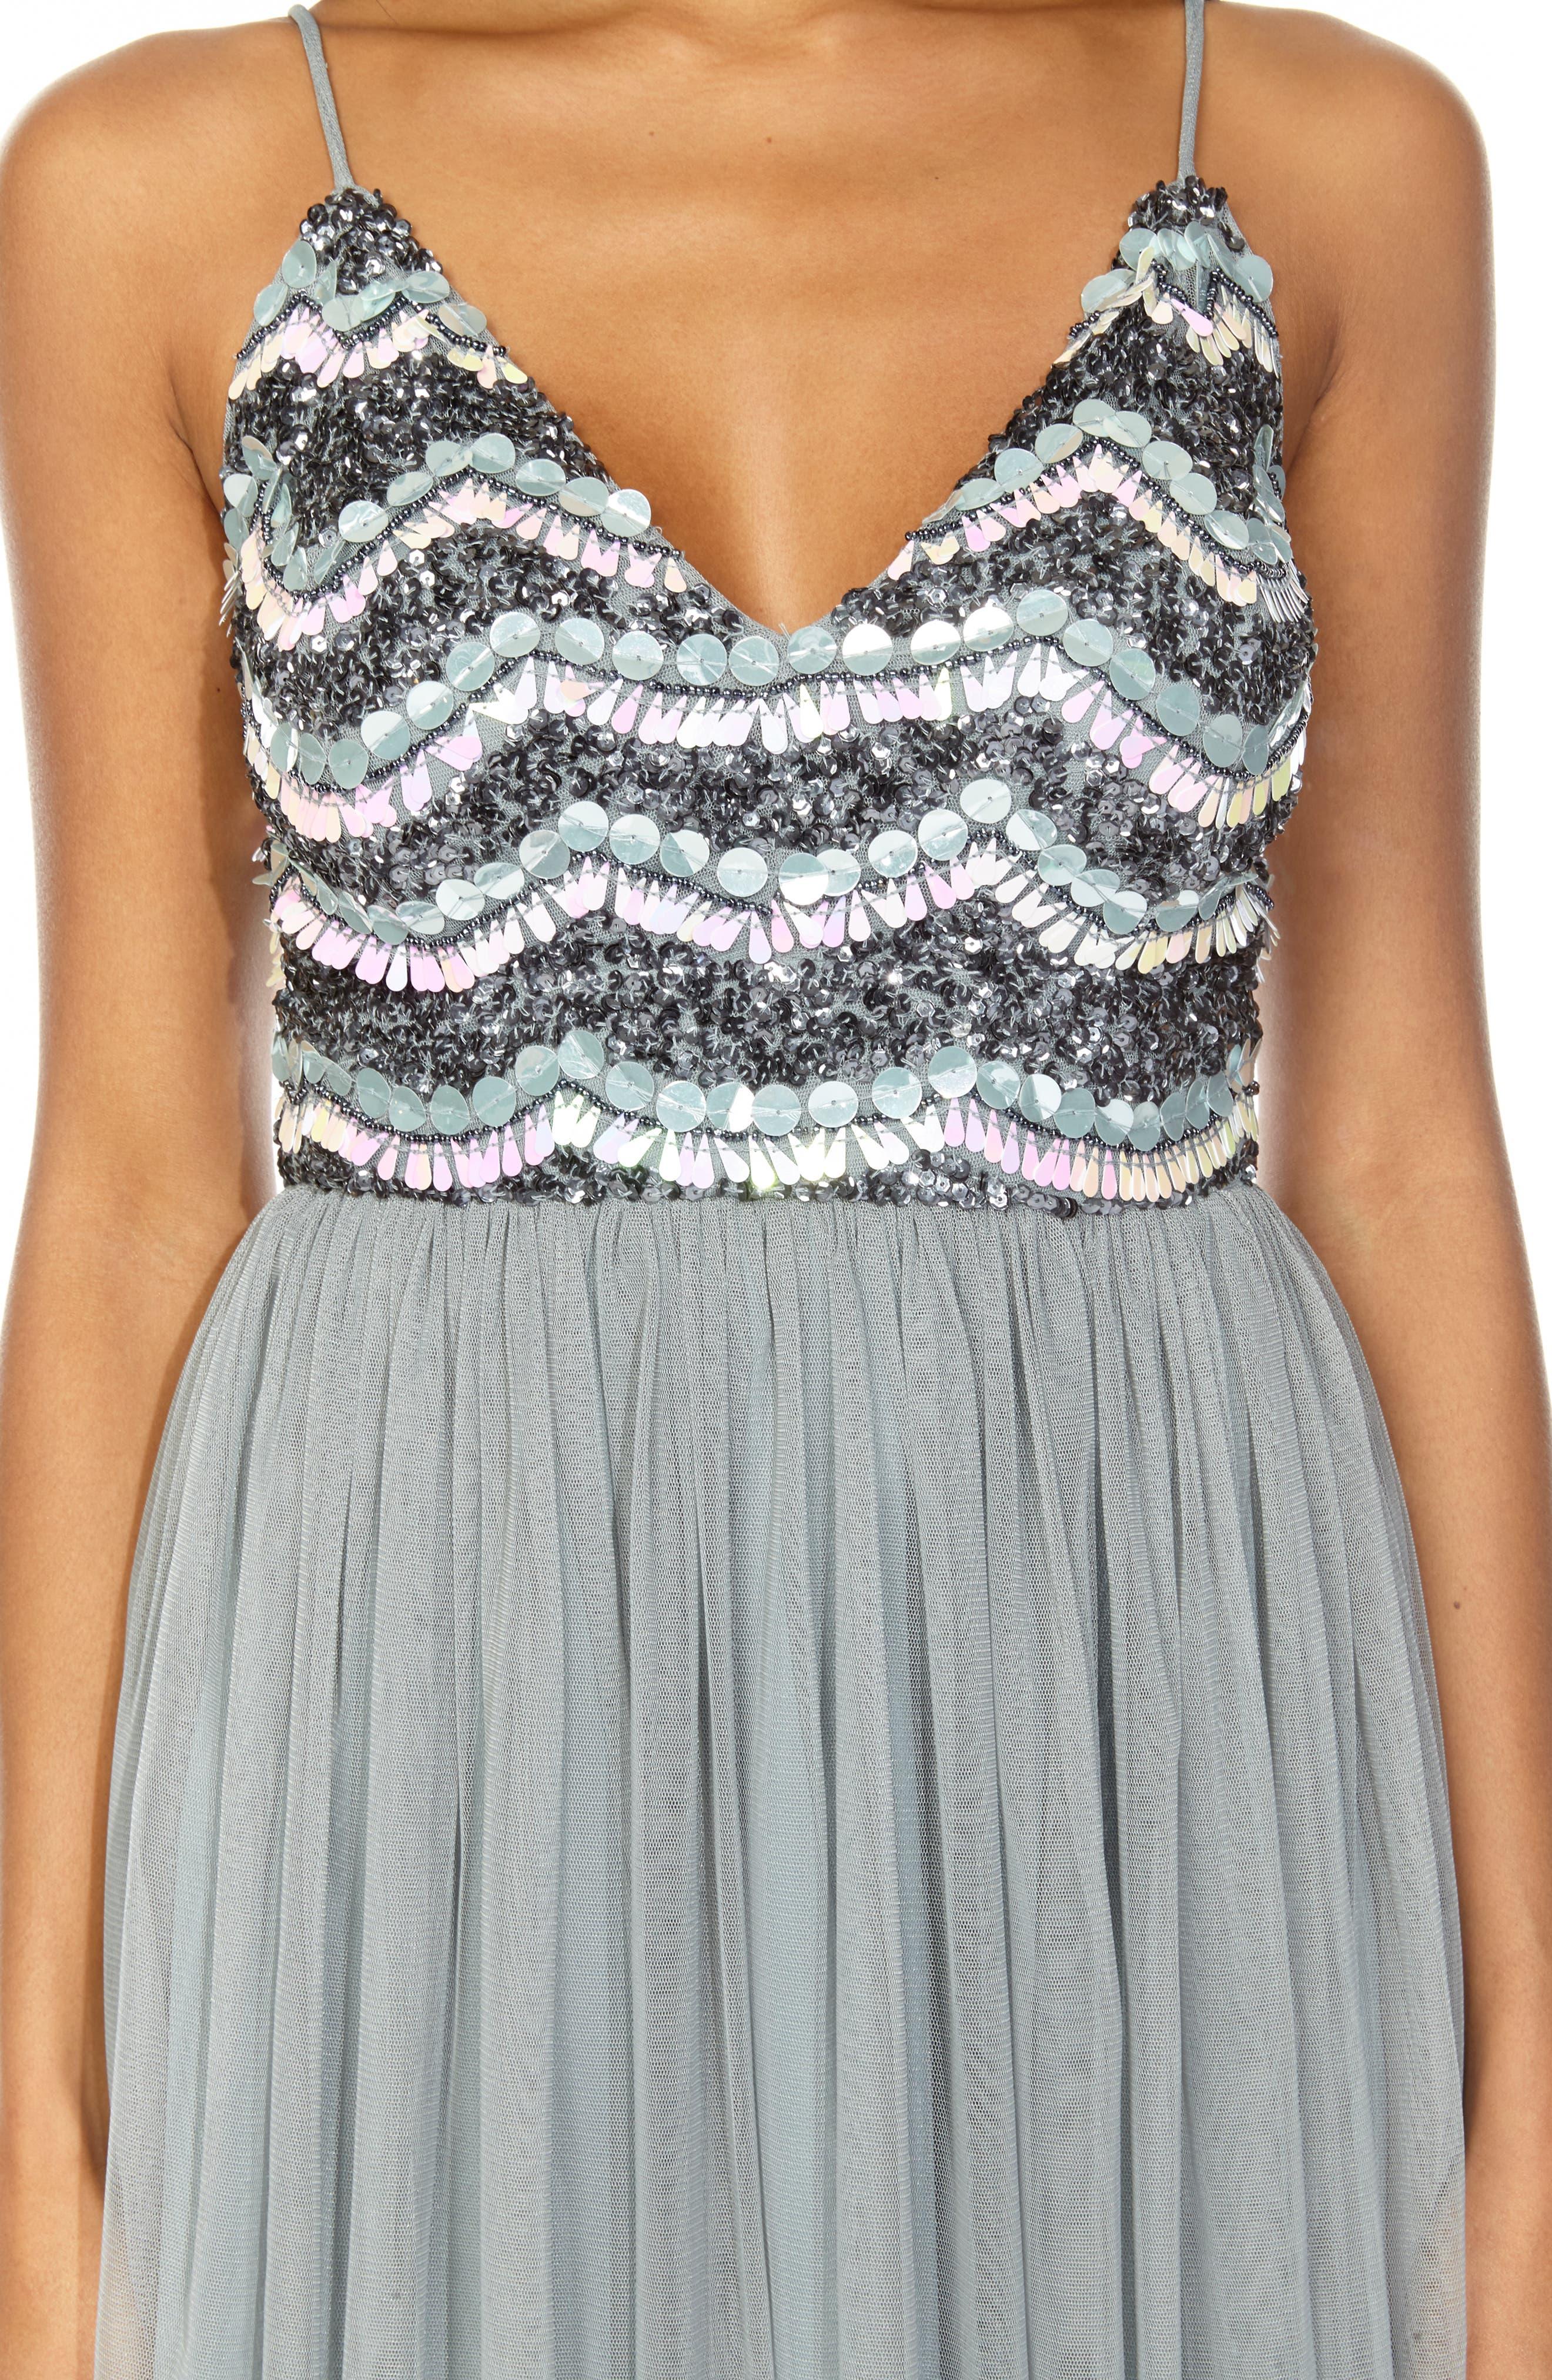 Amika Sequin & Mesh Party Dress,                             Alternate thumbnail 3, color,                             GREY